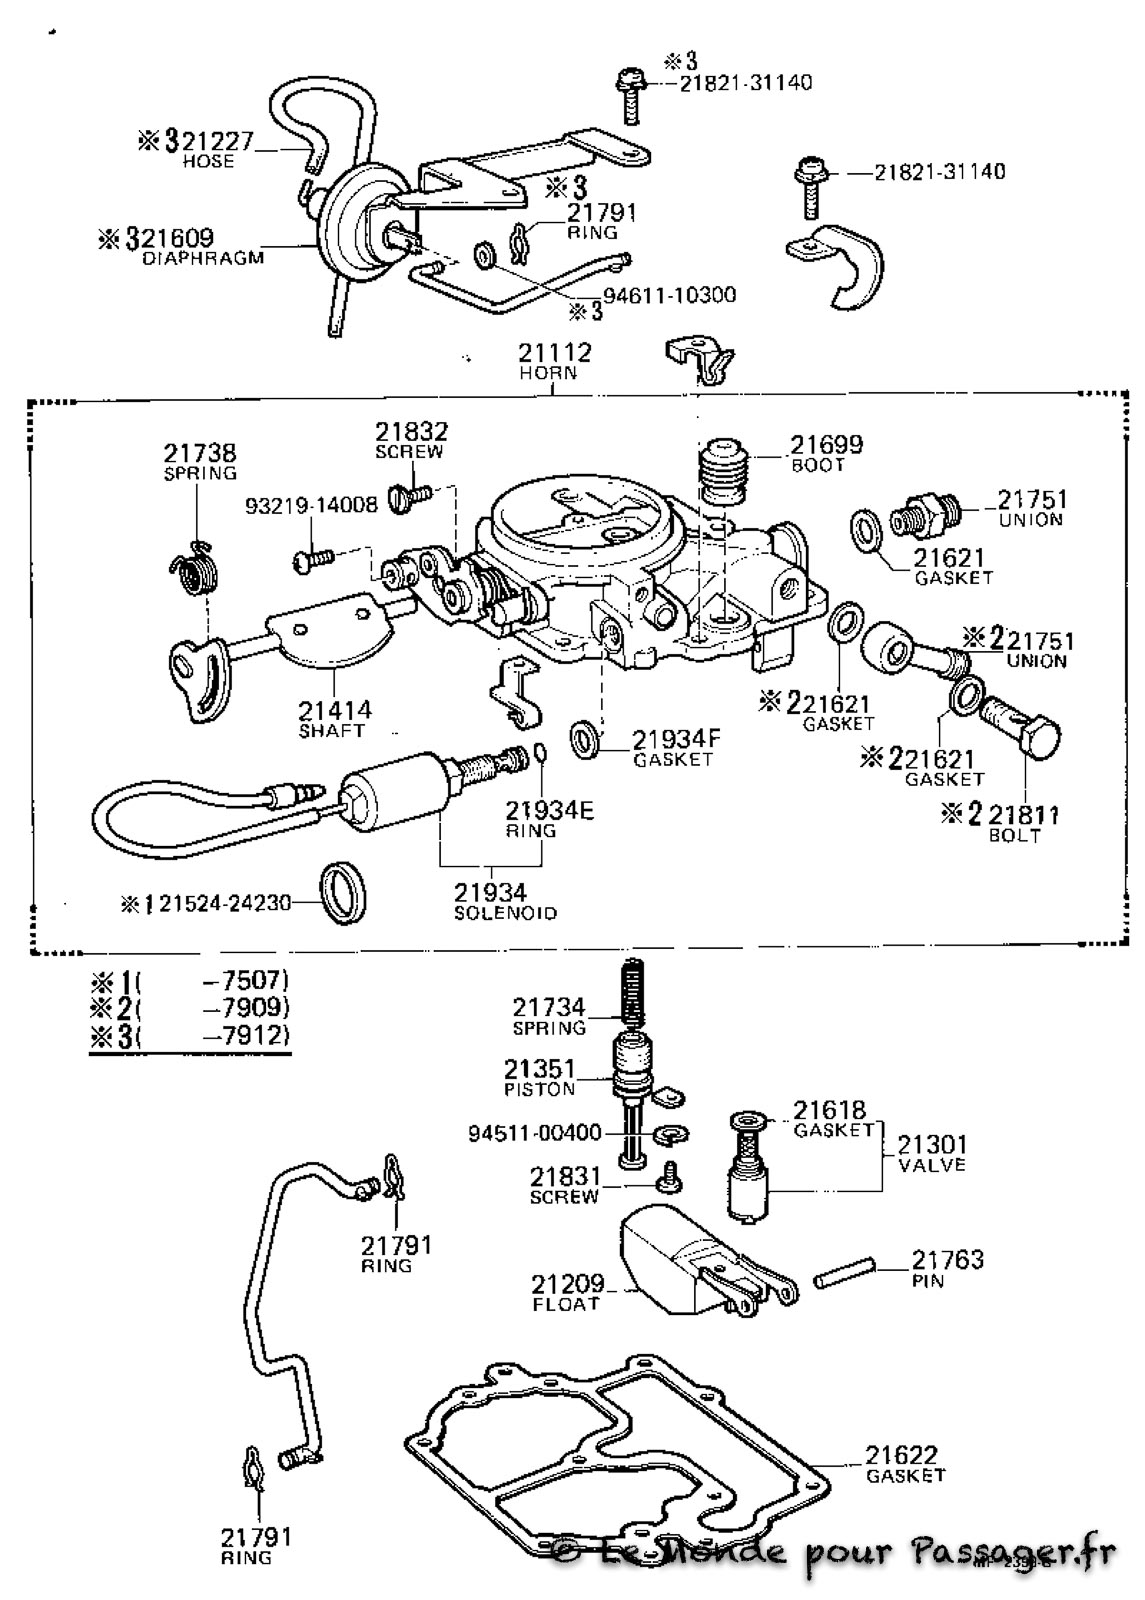 Fj55-Eclatés-Techniques095